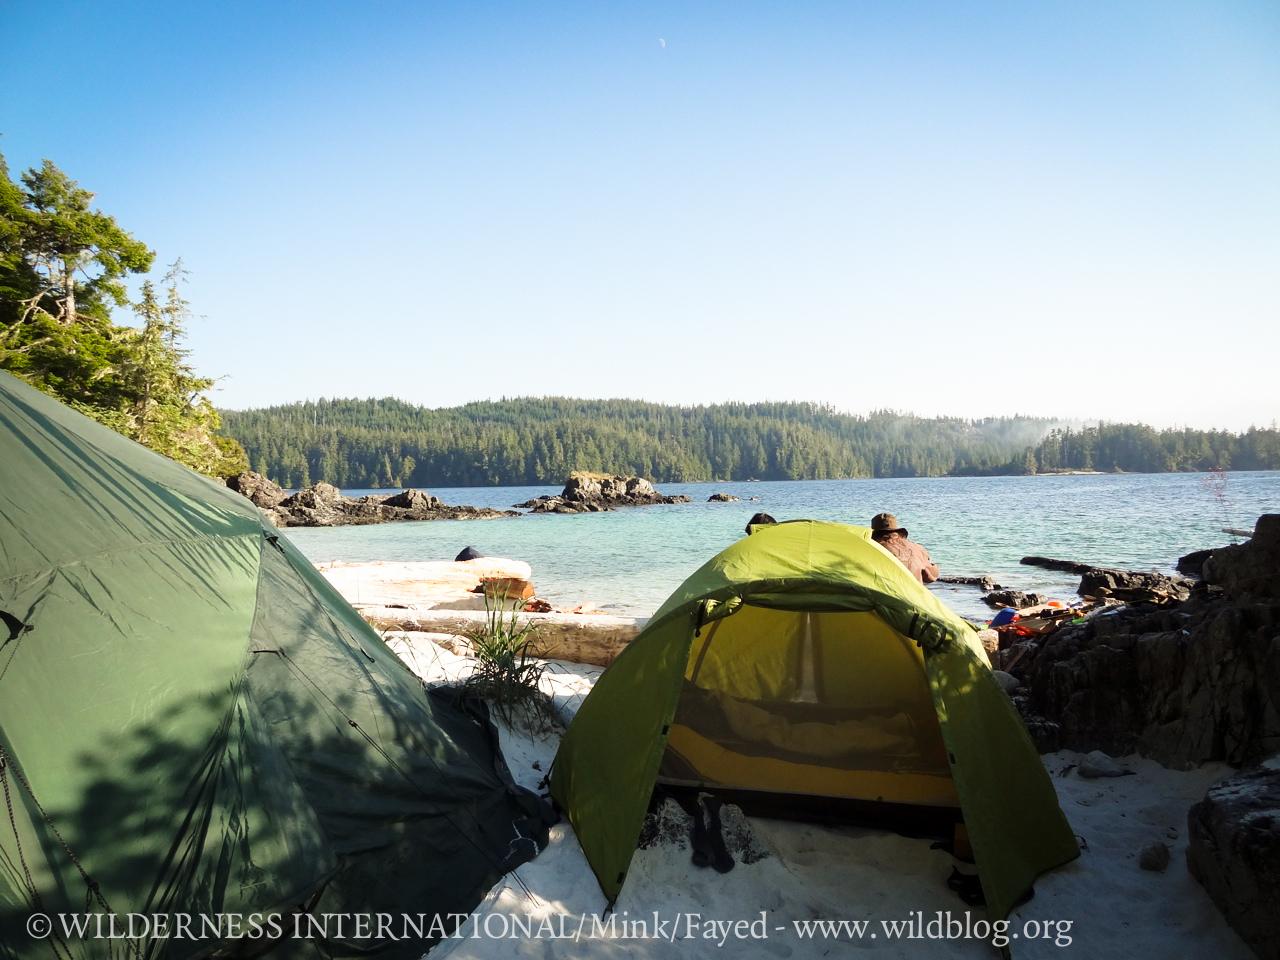 http://wi.wildblog.org/wp-content/uploads/2012/07/lr-08903.jpg